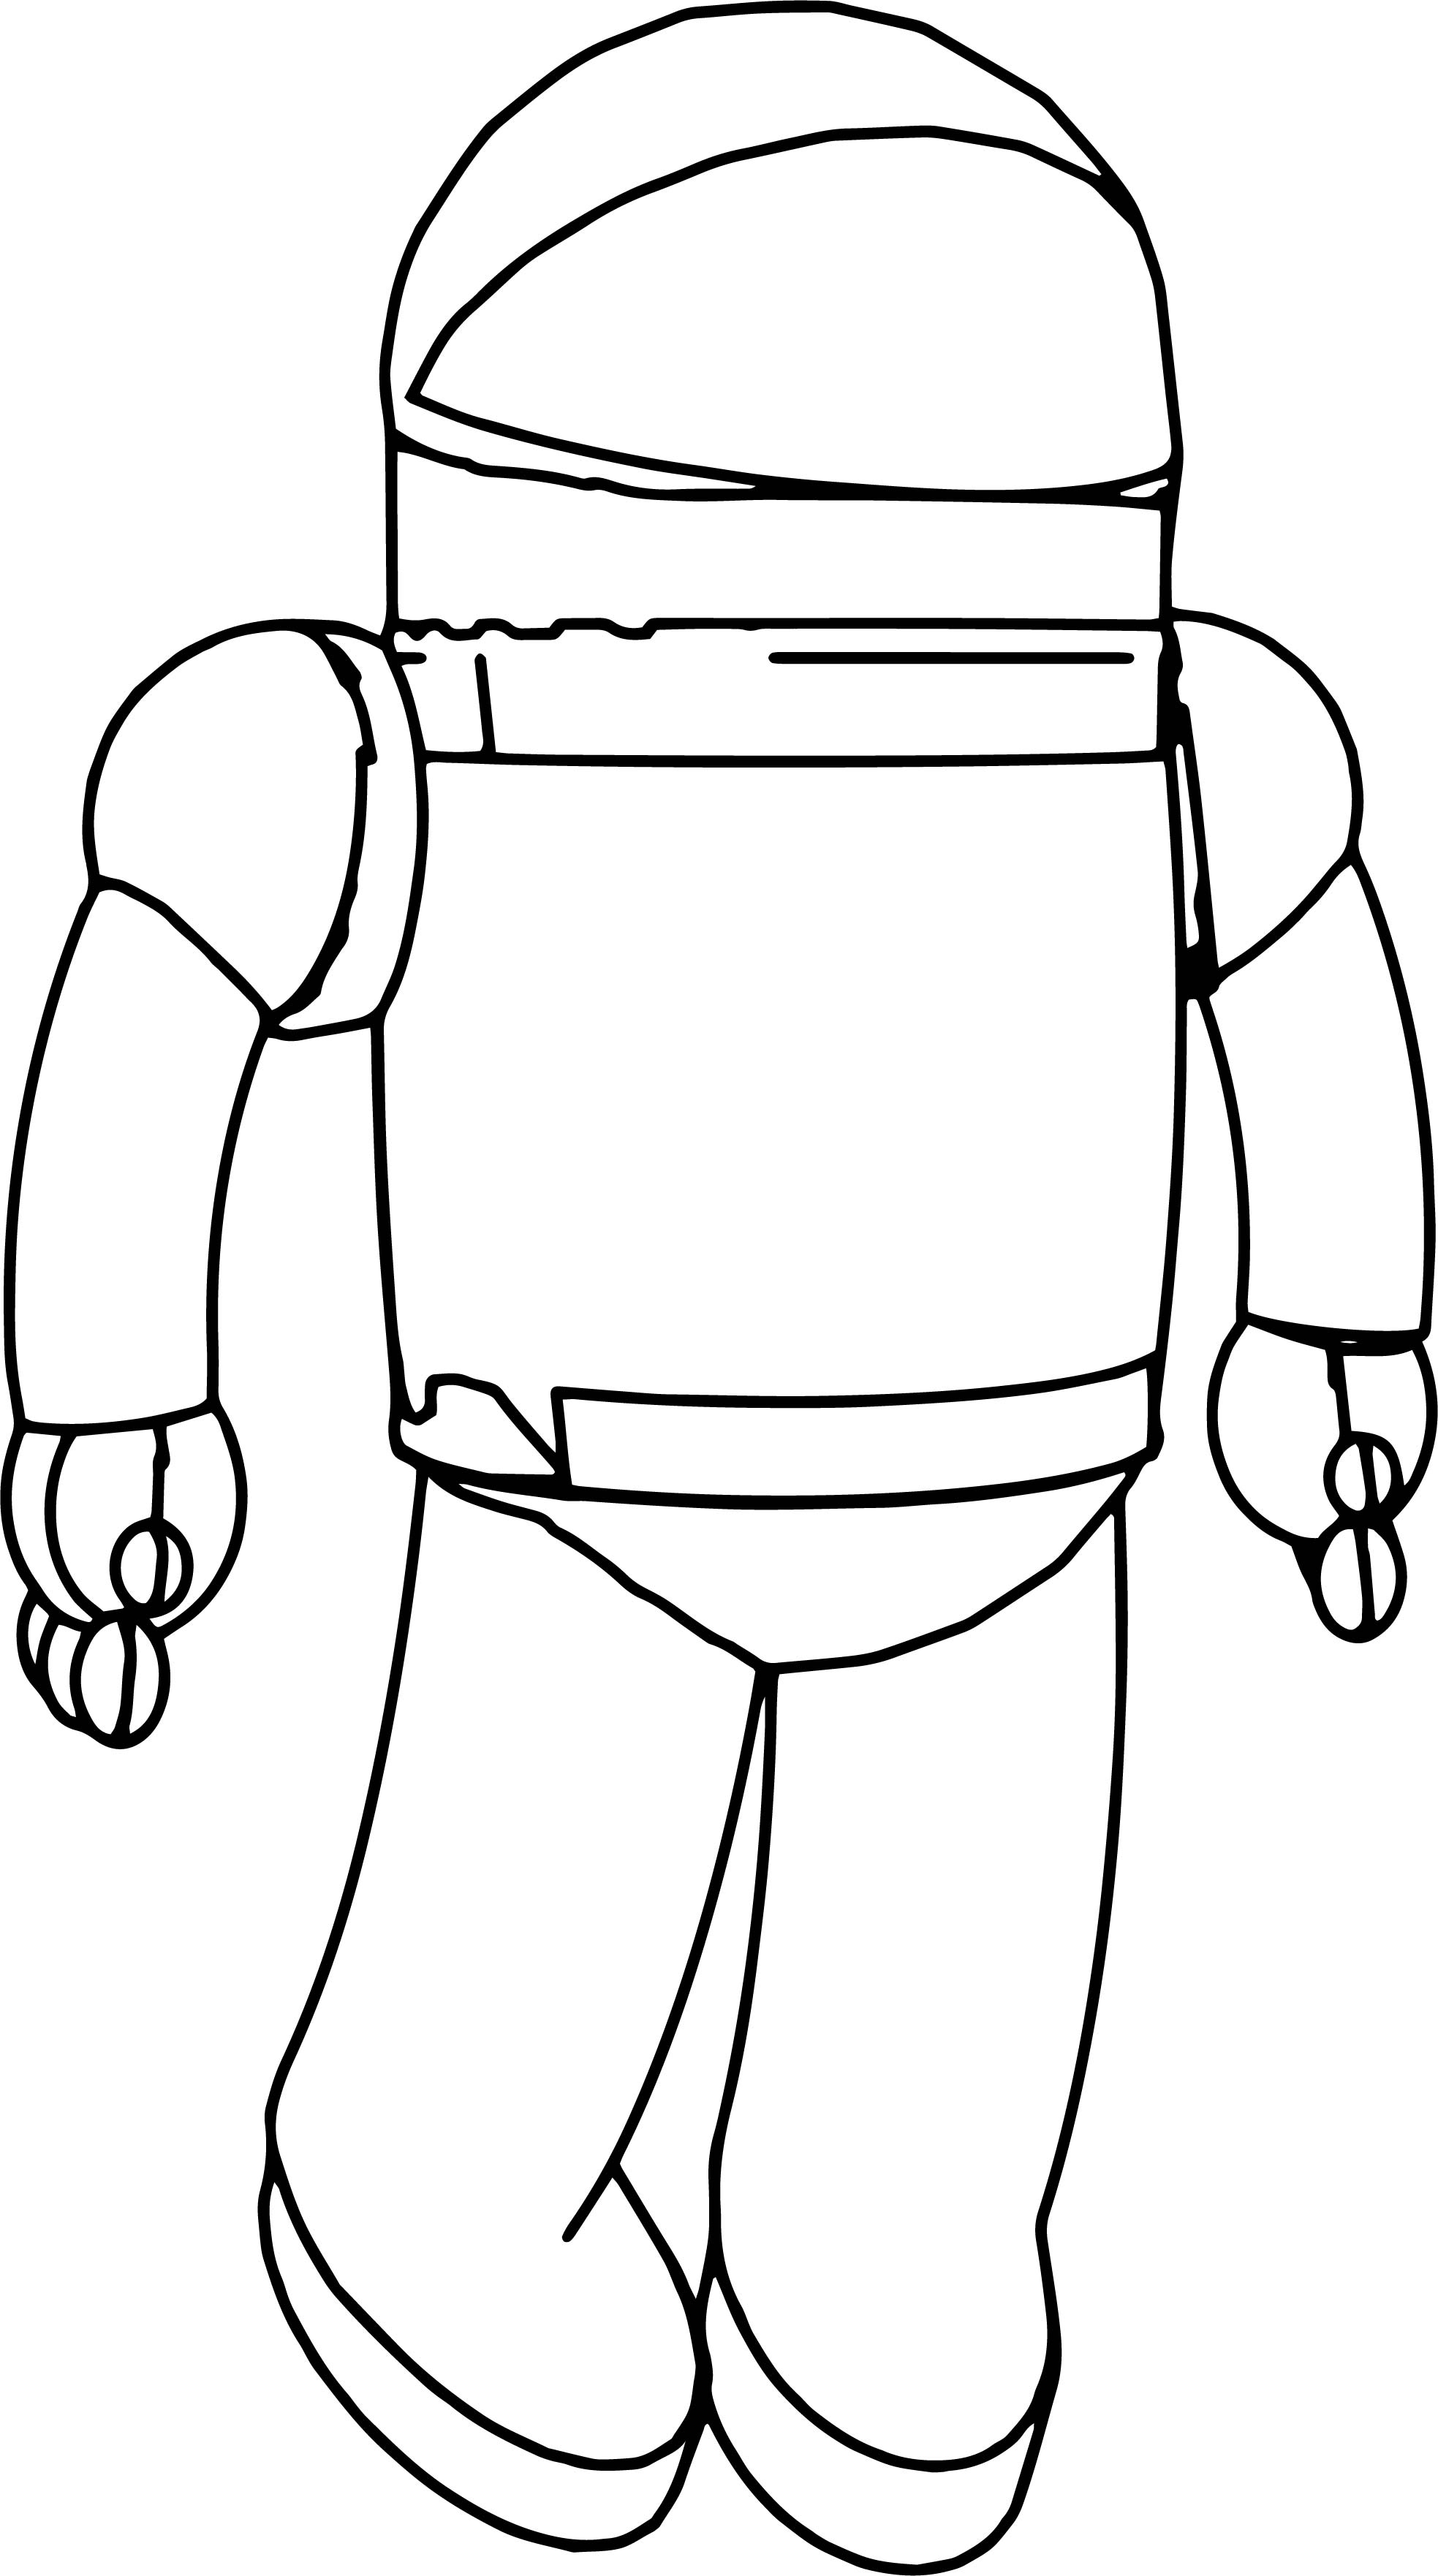 spaceman cartoon coloring page